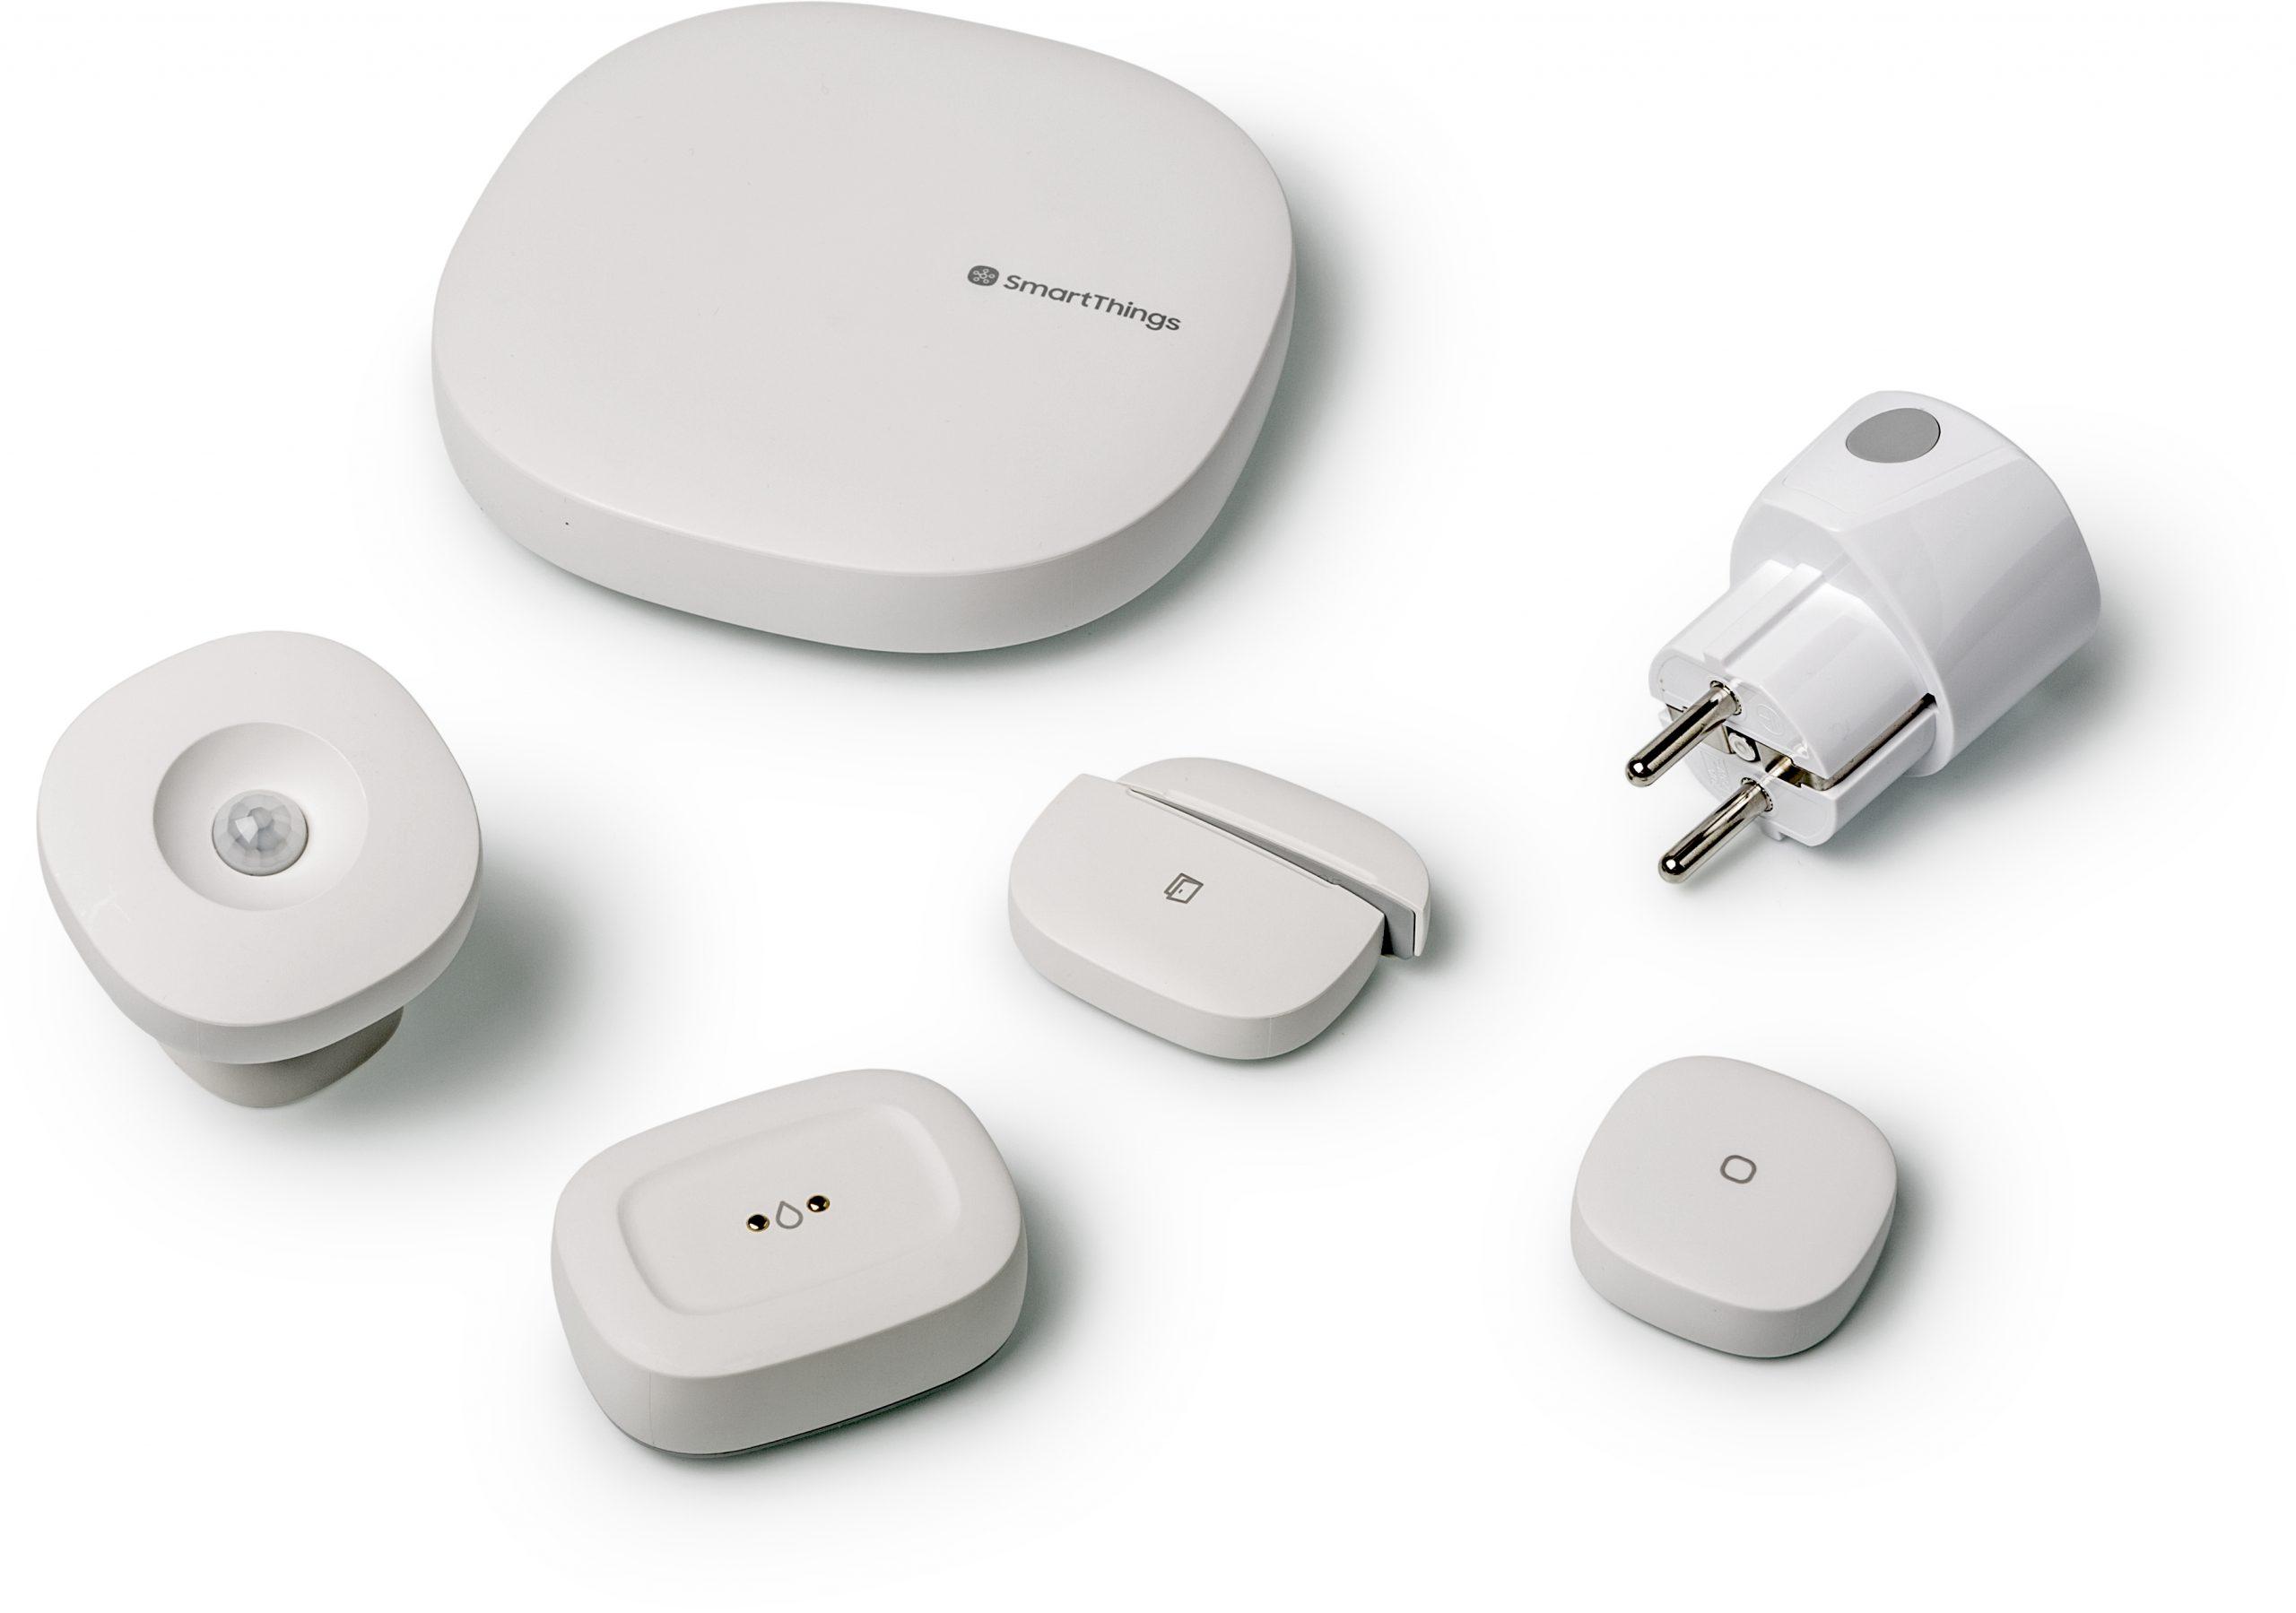 Samsung SmartThings smarthome hub platform review test